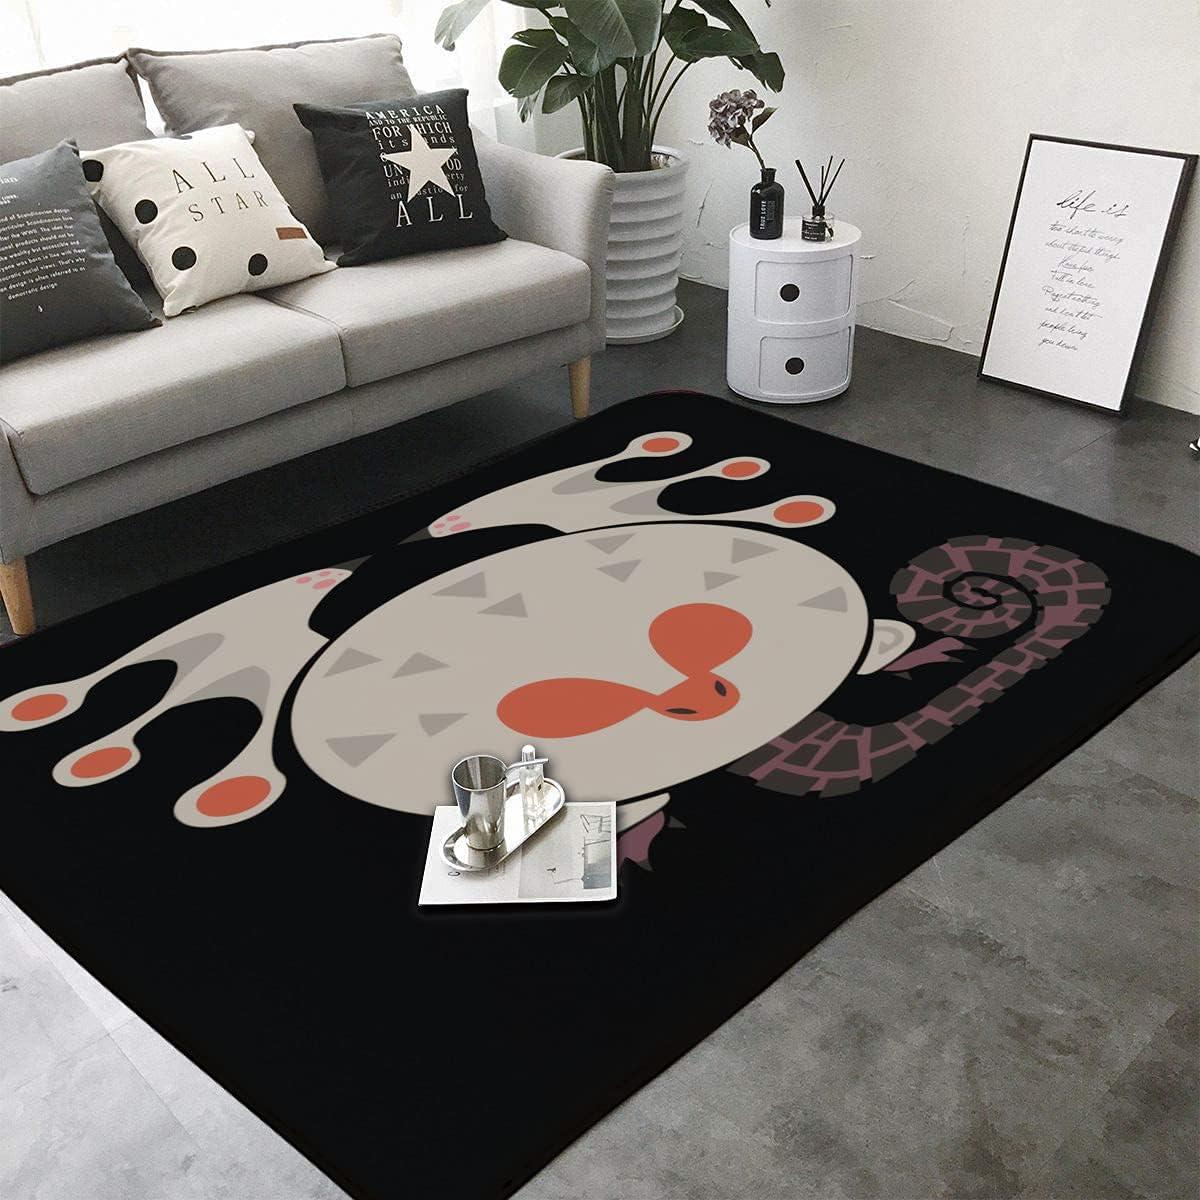 Paolumu-Kids Rugs for Bedroom Playroom Car Mats 5 ☆ very popular Carpet Chair Spring new work